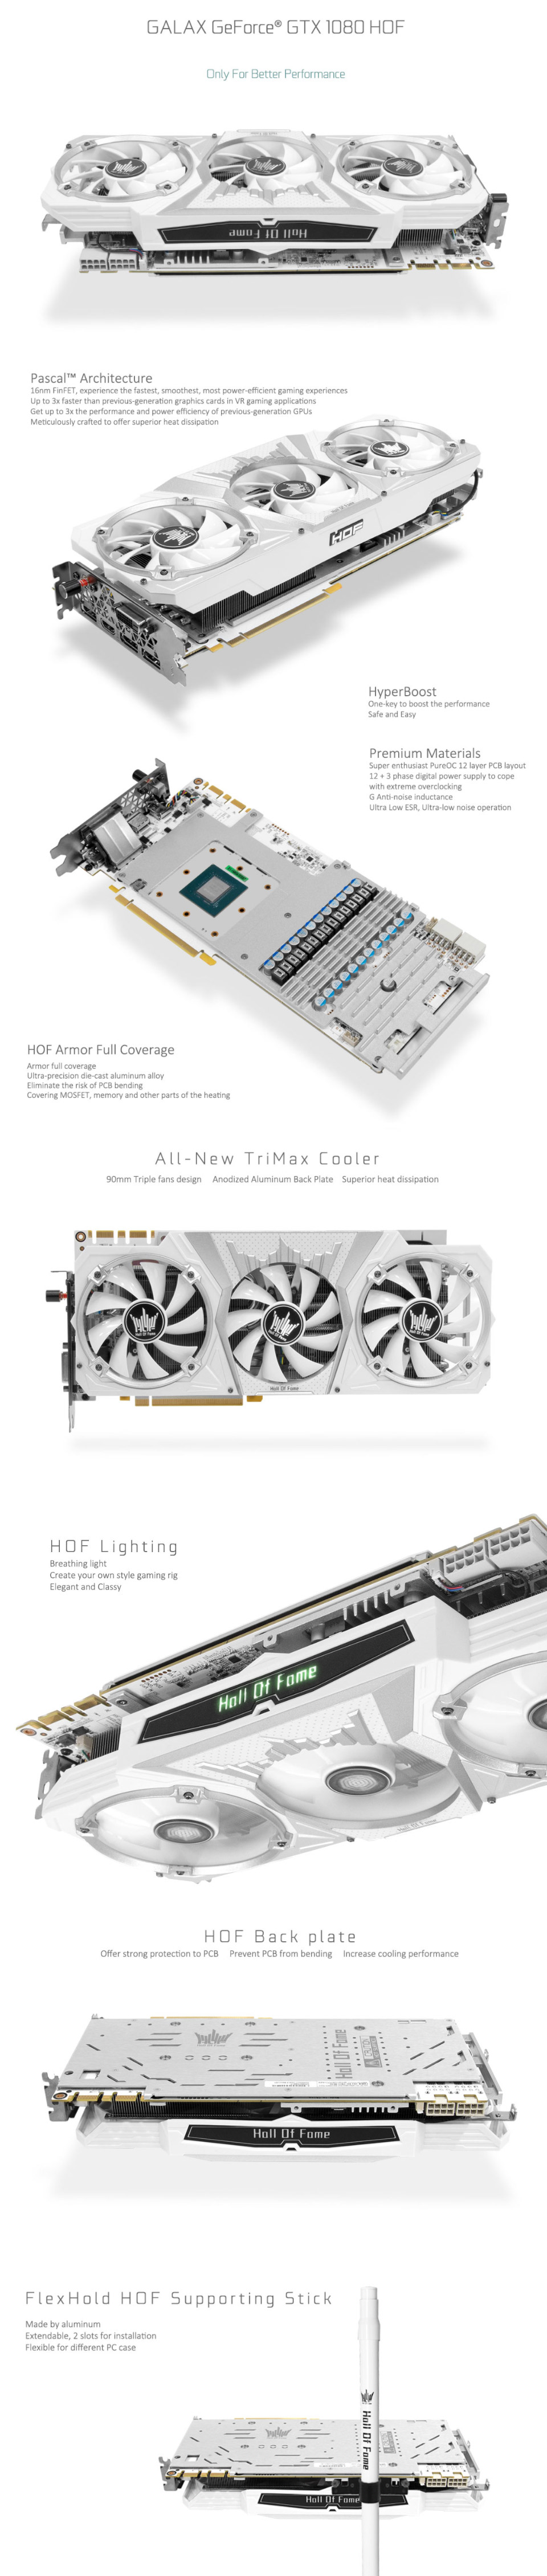 Galax GeForce GTX 1080 Hall of Fame Edition 8GB [GLX-GTX1080